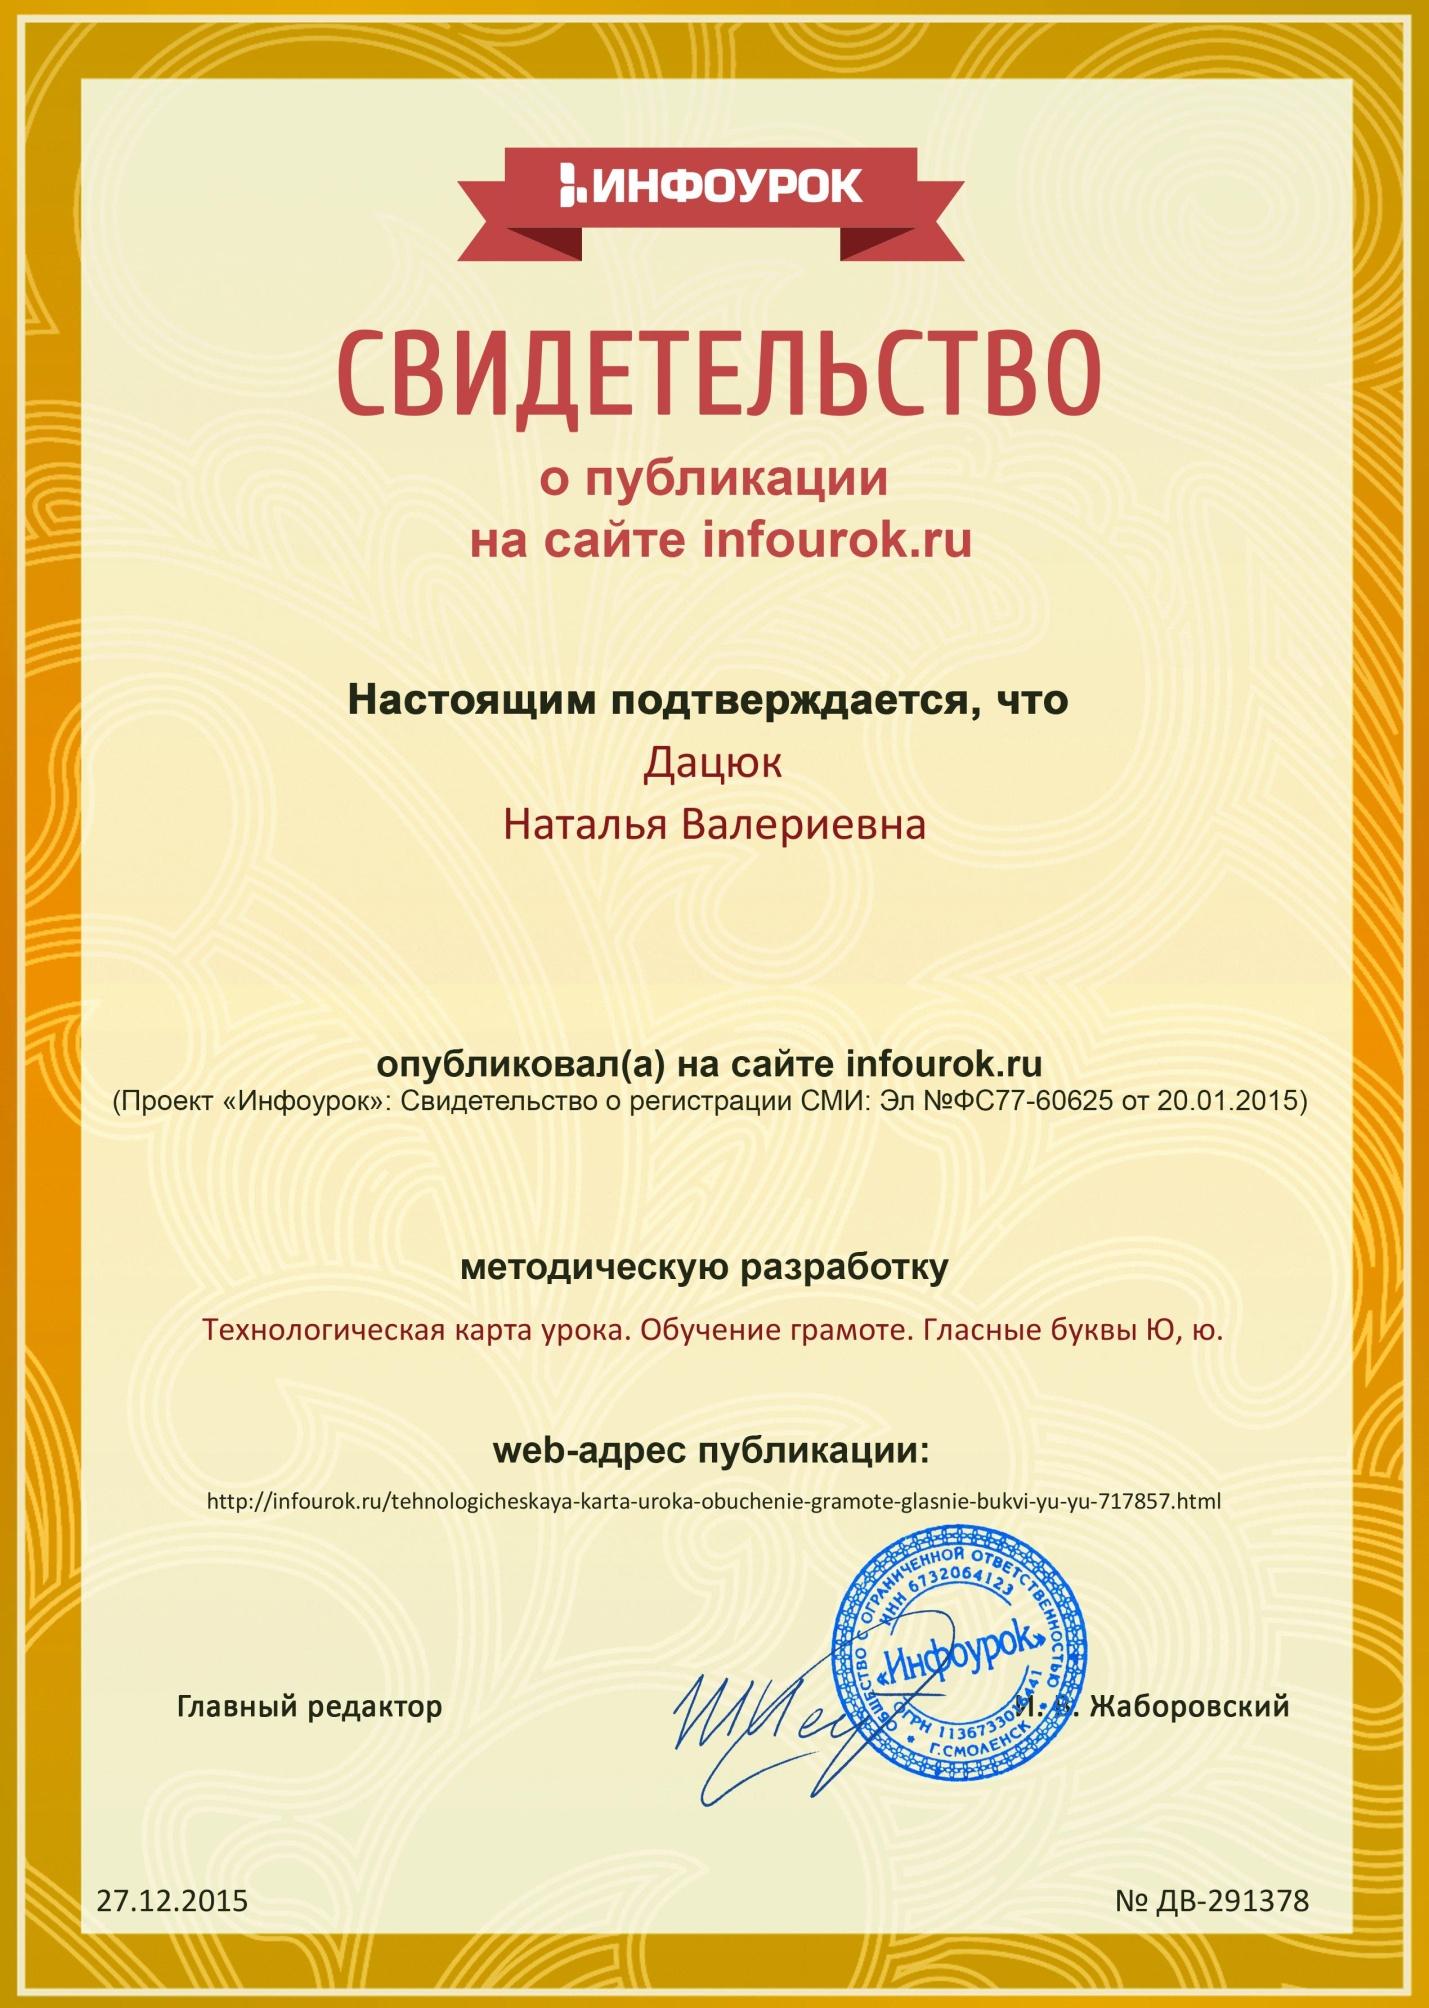 Сертификат проекта infourok.ru № ДВ-291378.jpg